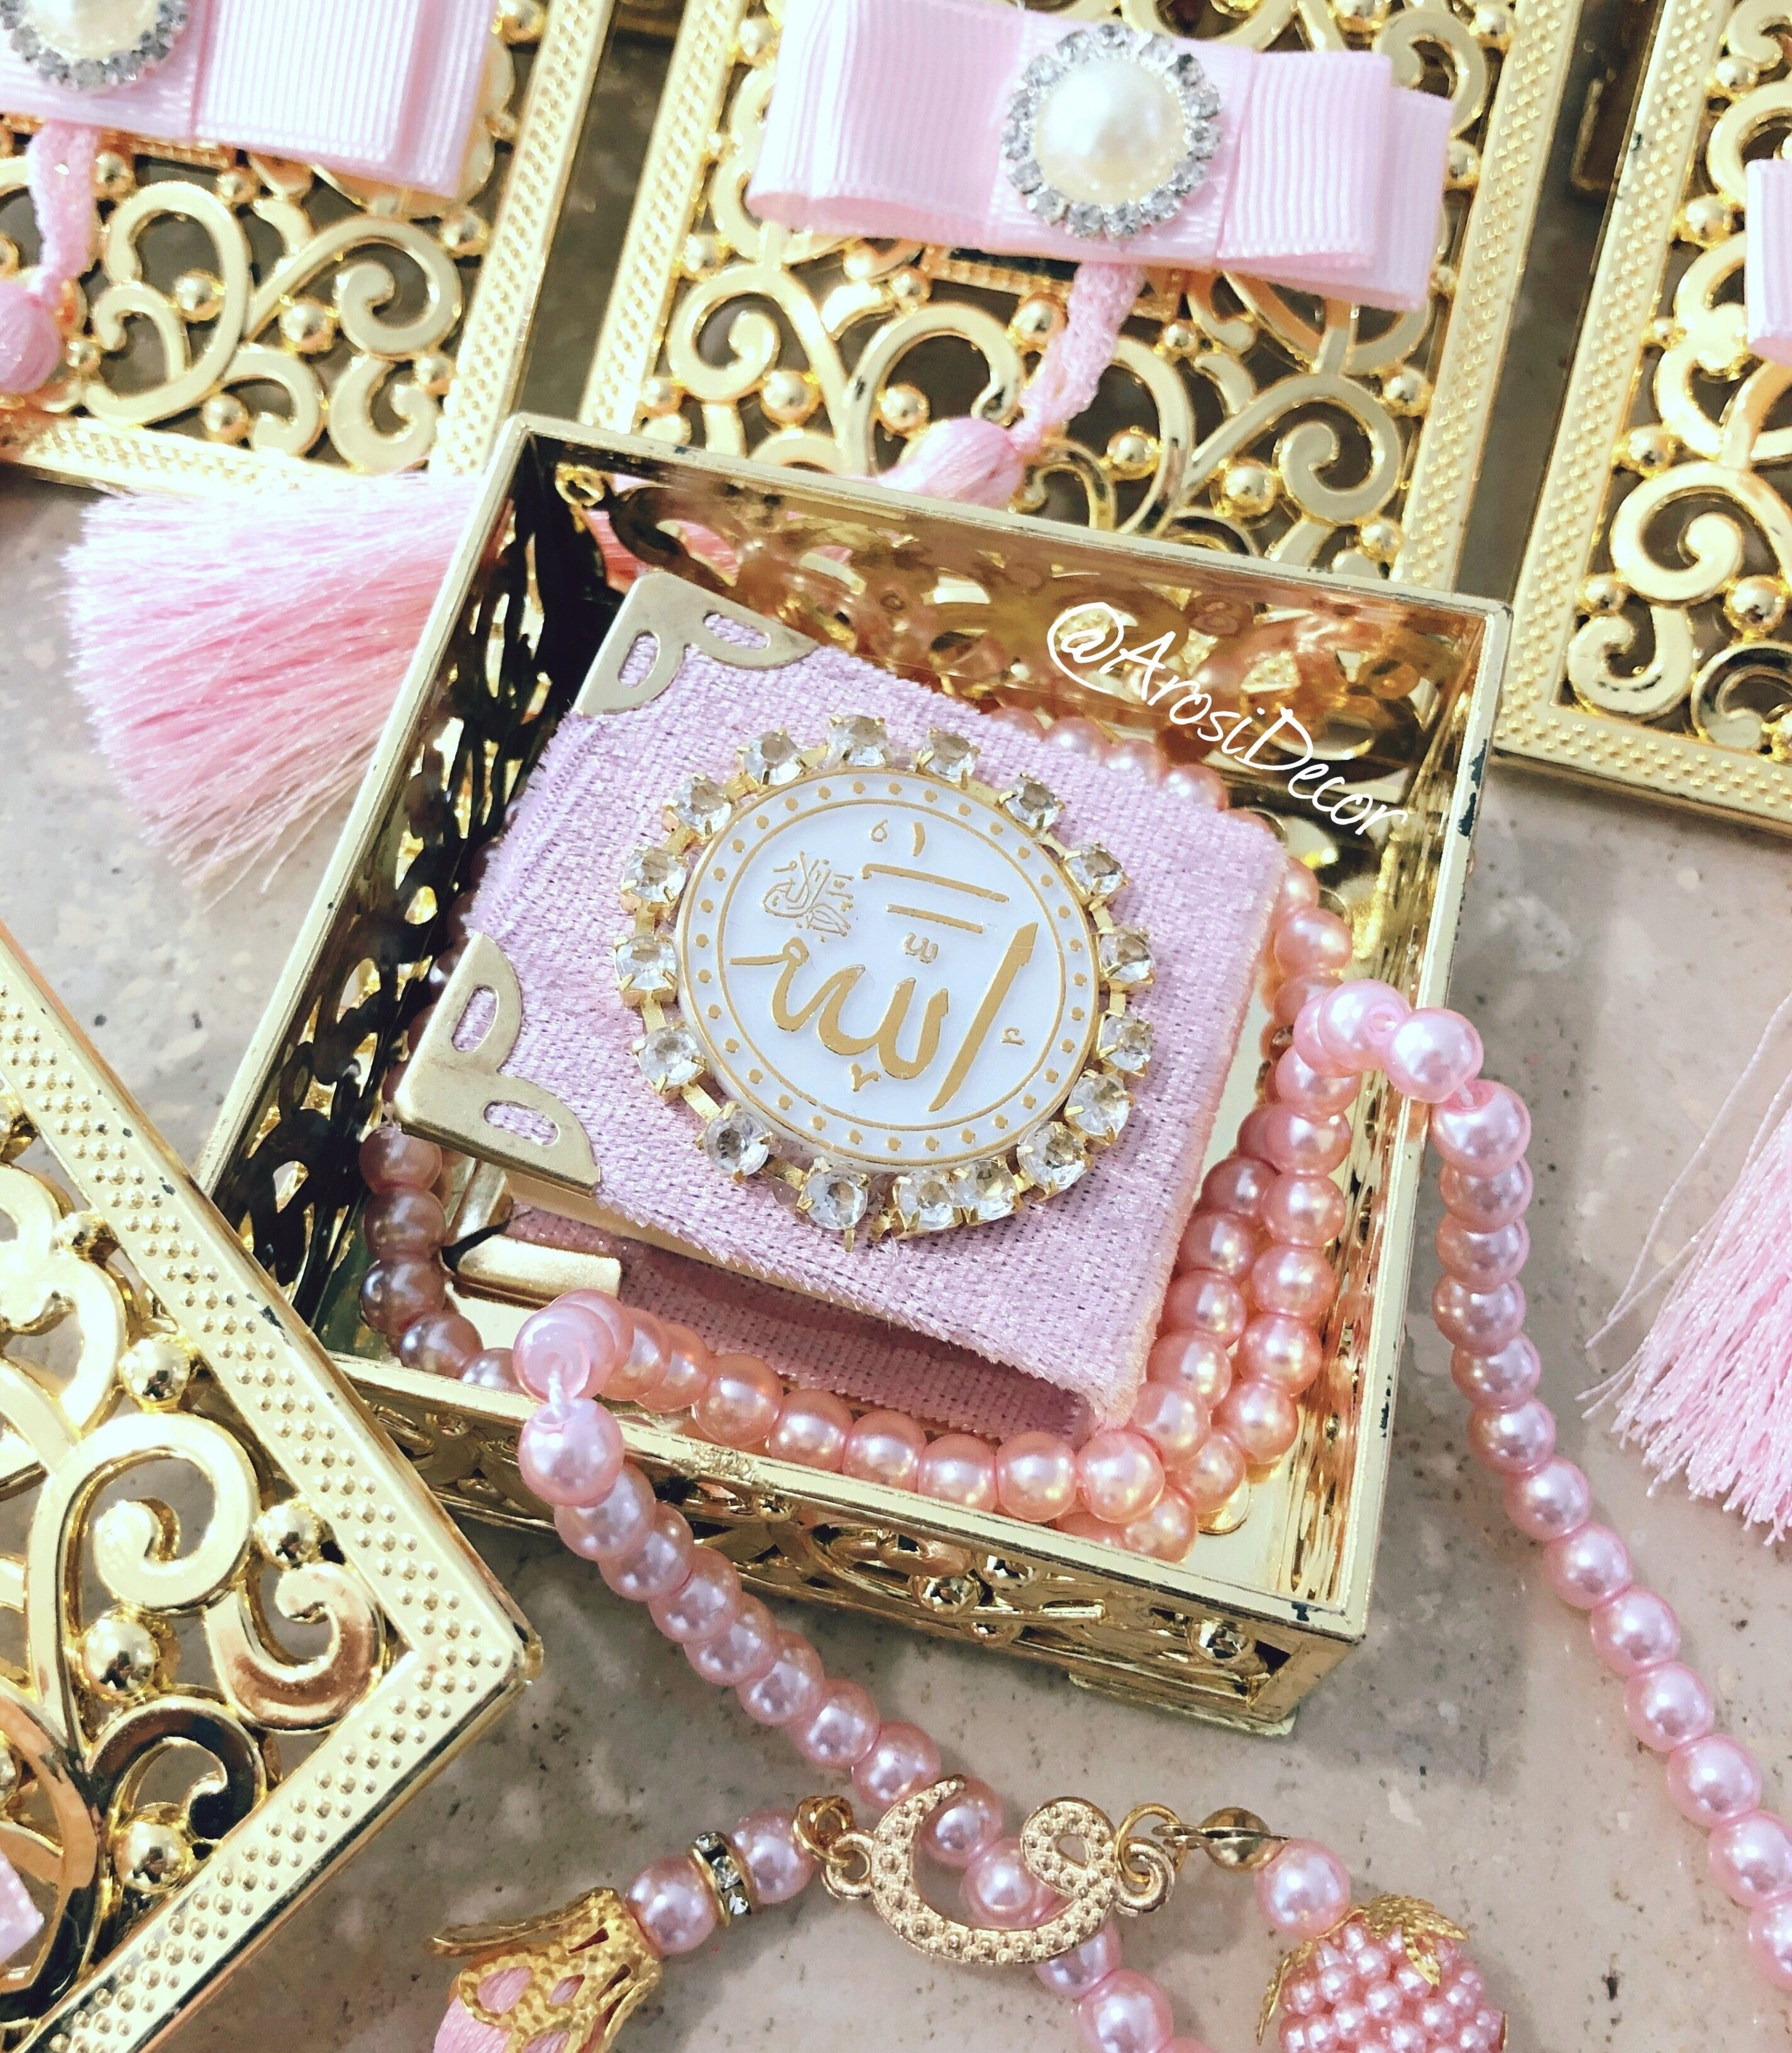 Mini Quran Gift Set Ramadan Ramadangift Eid Eidgift Muslim Islam Miniquran Tasbih Prayerbeads Dua Diy Wedding Favors Wedding Favours Arabian Party